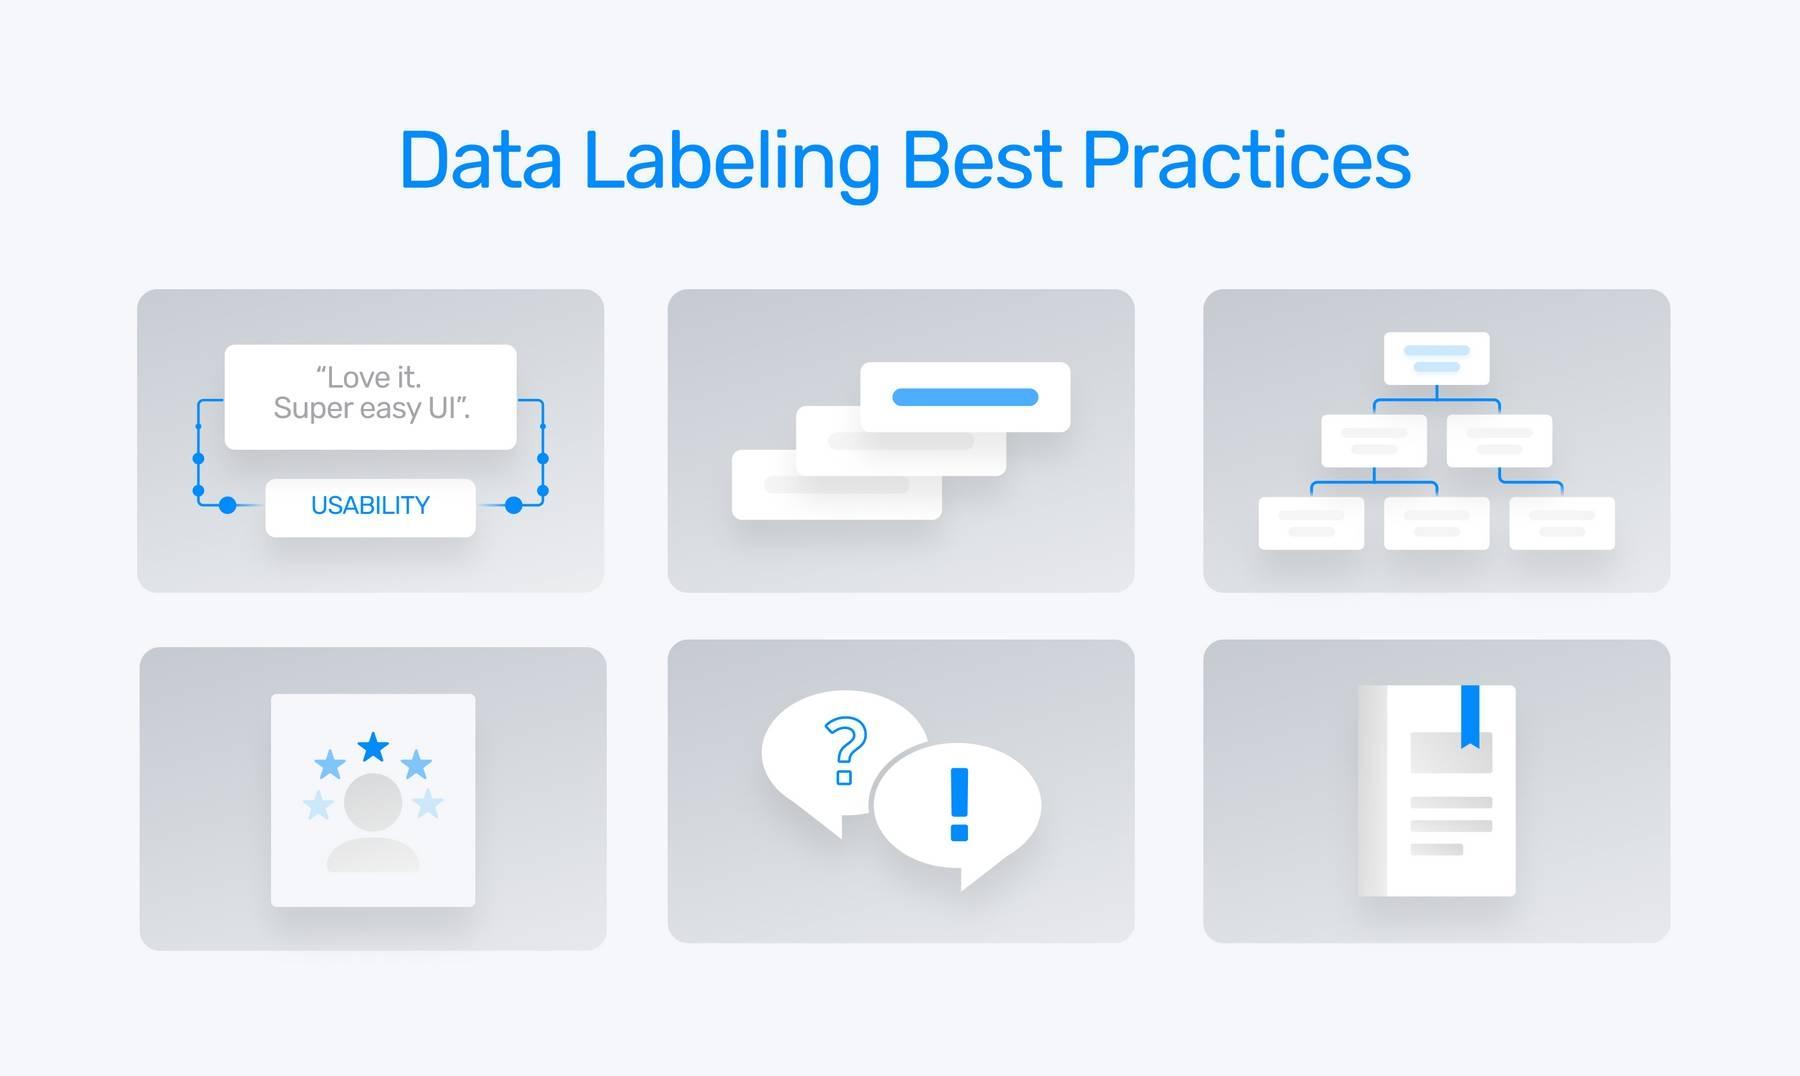 Data labeling best practices